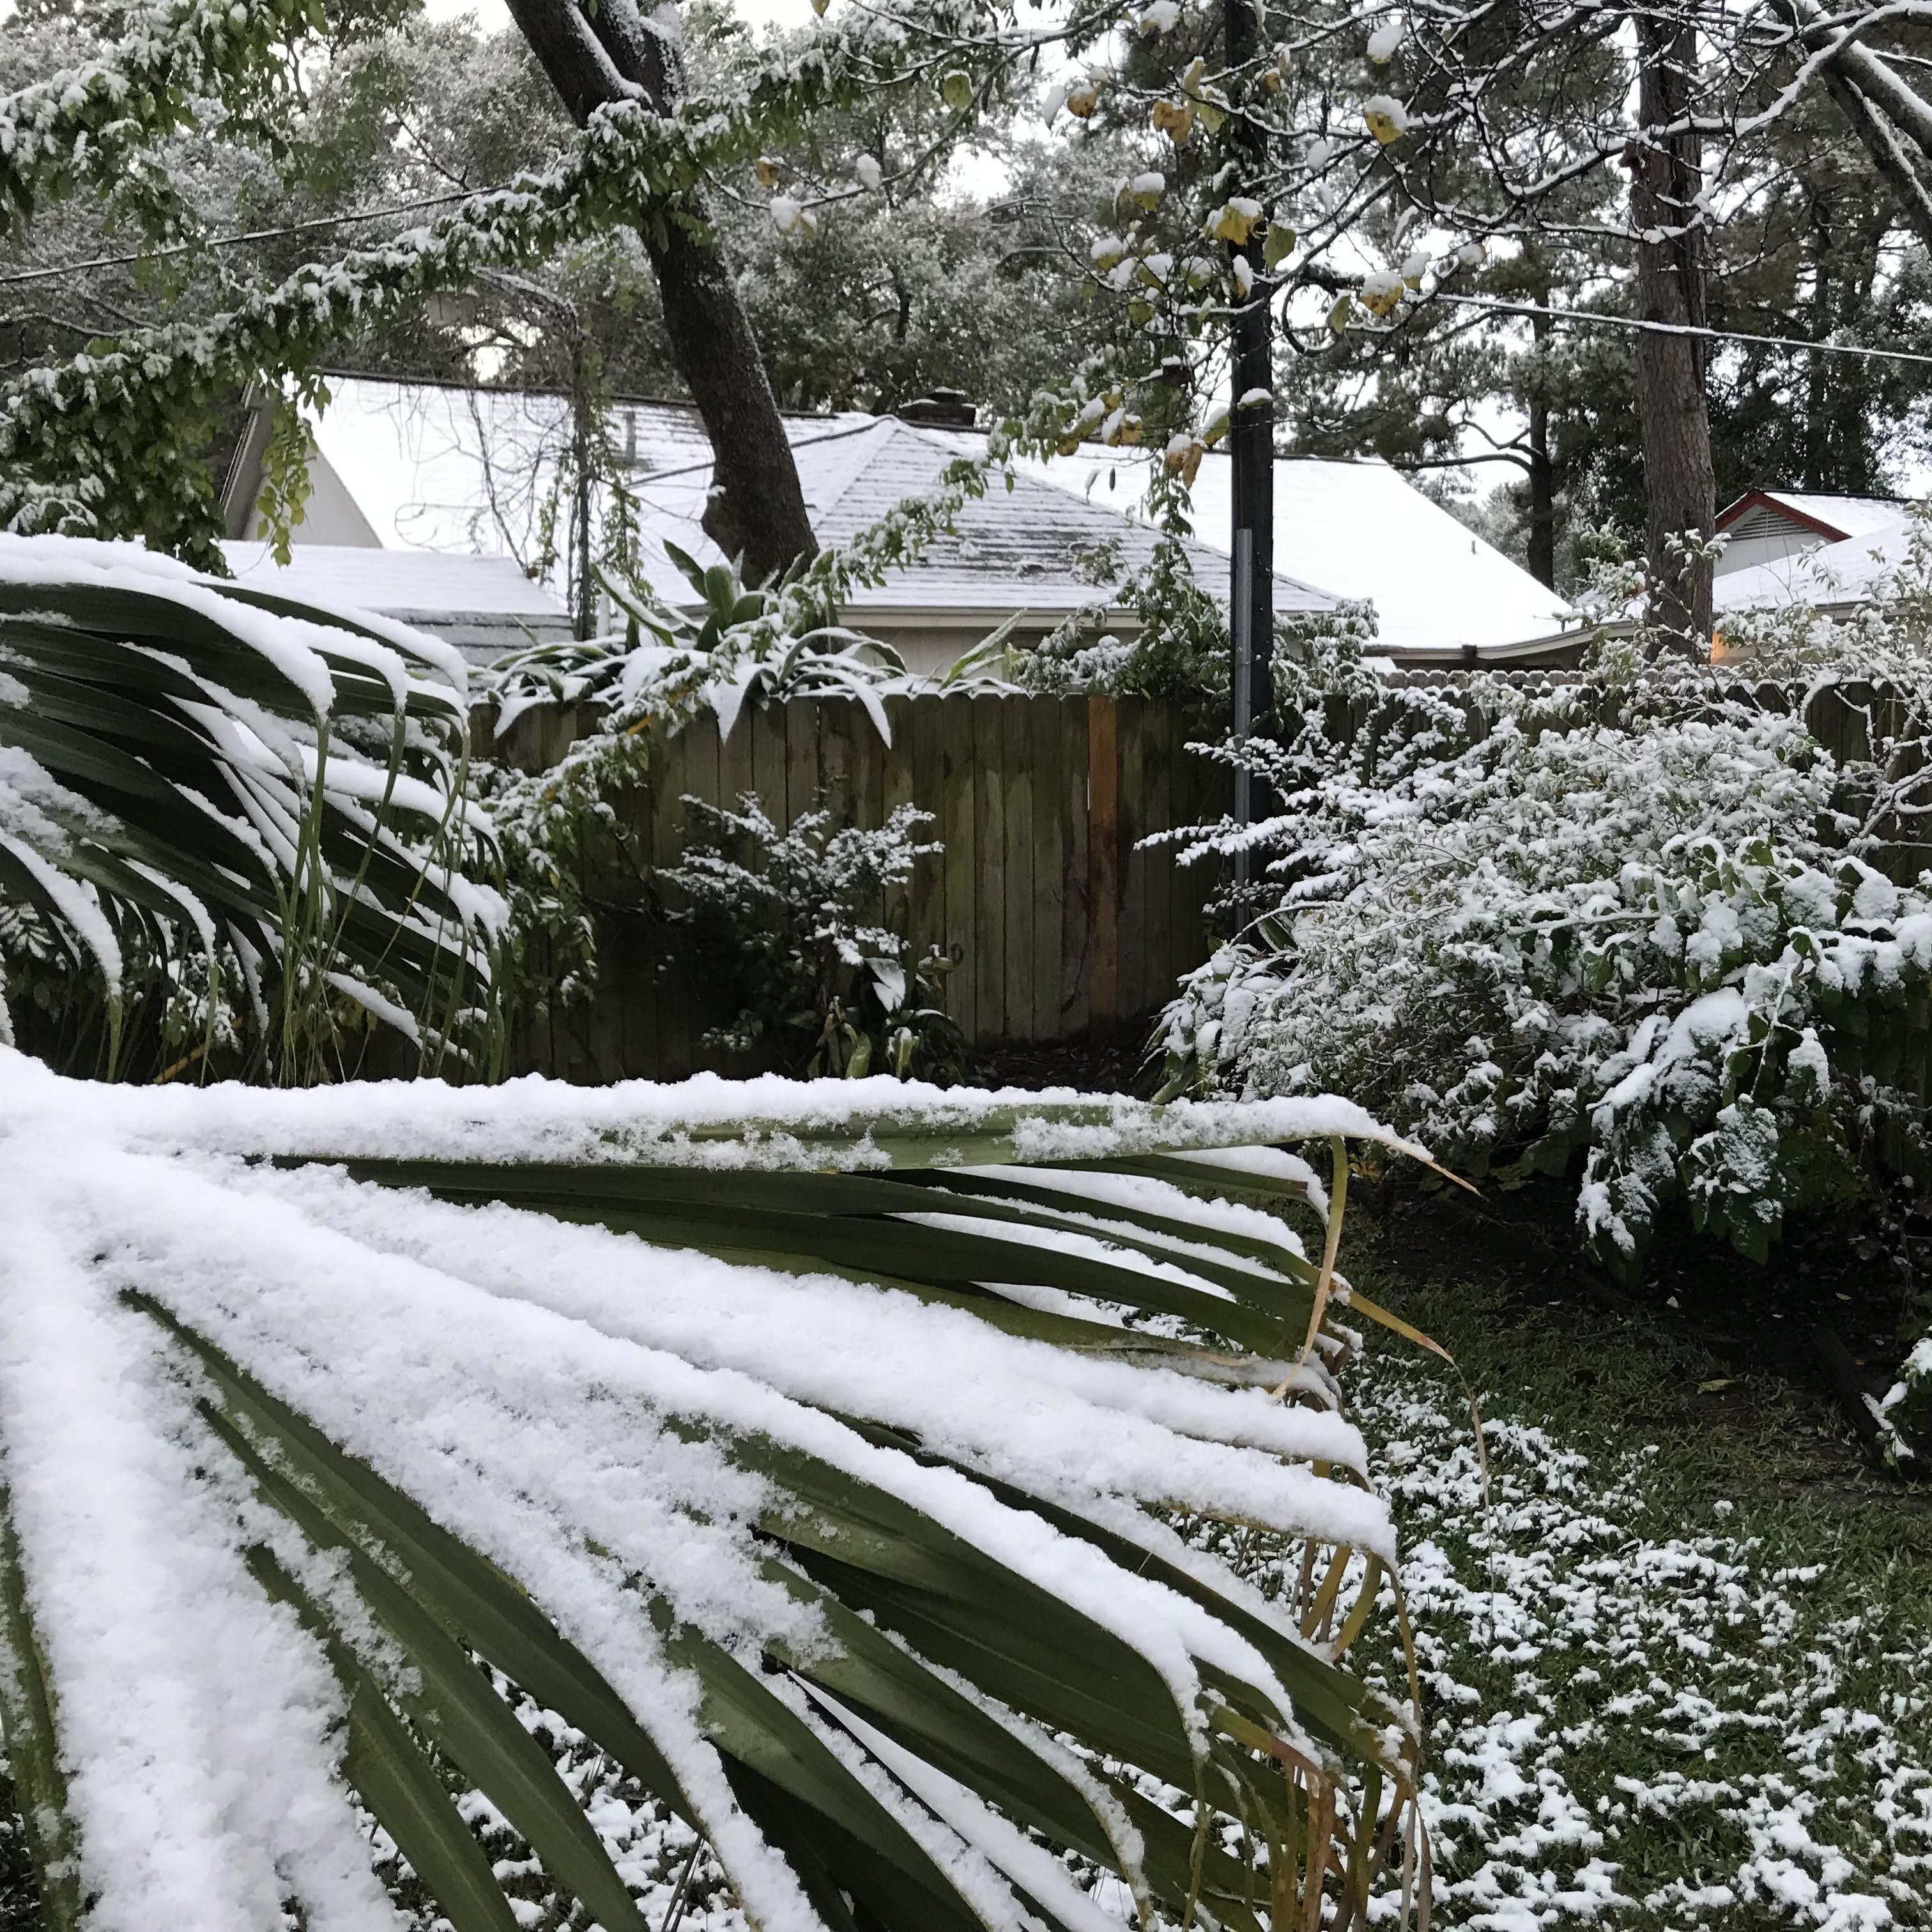 Snow dordmo